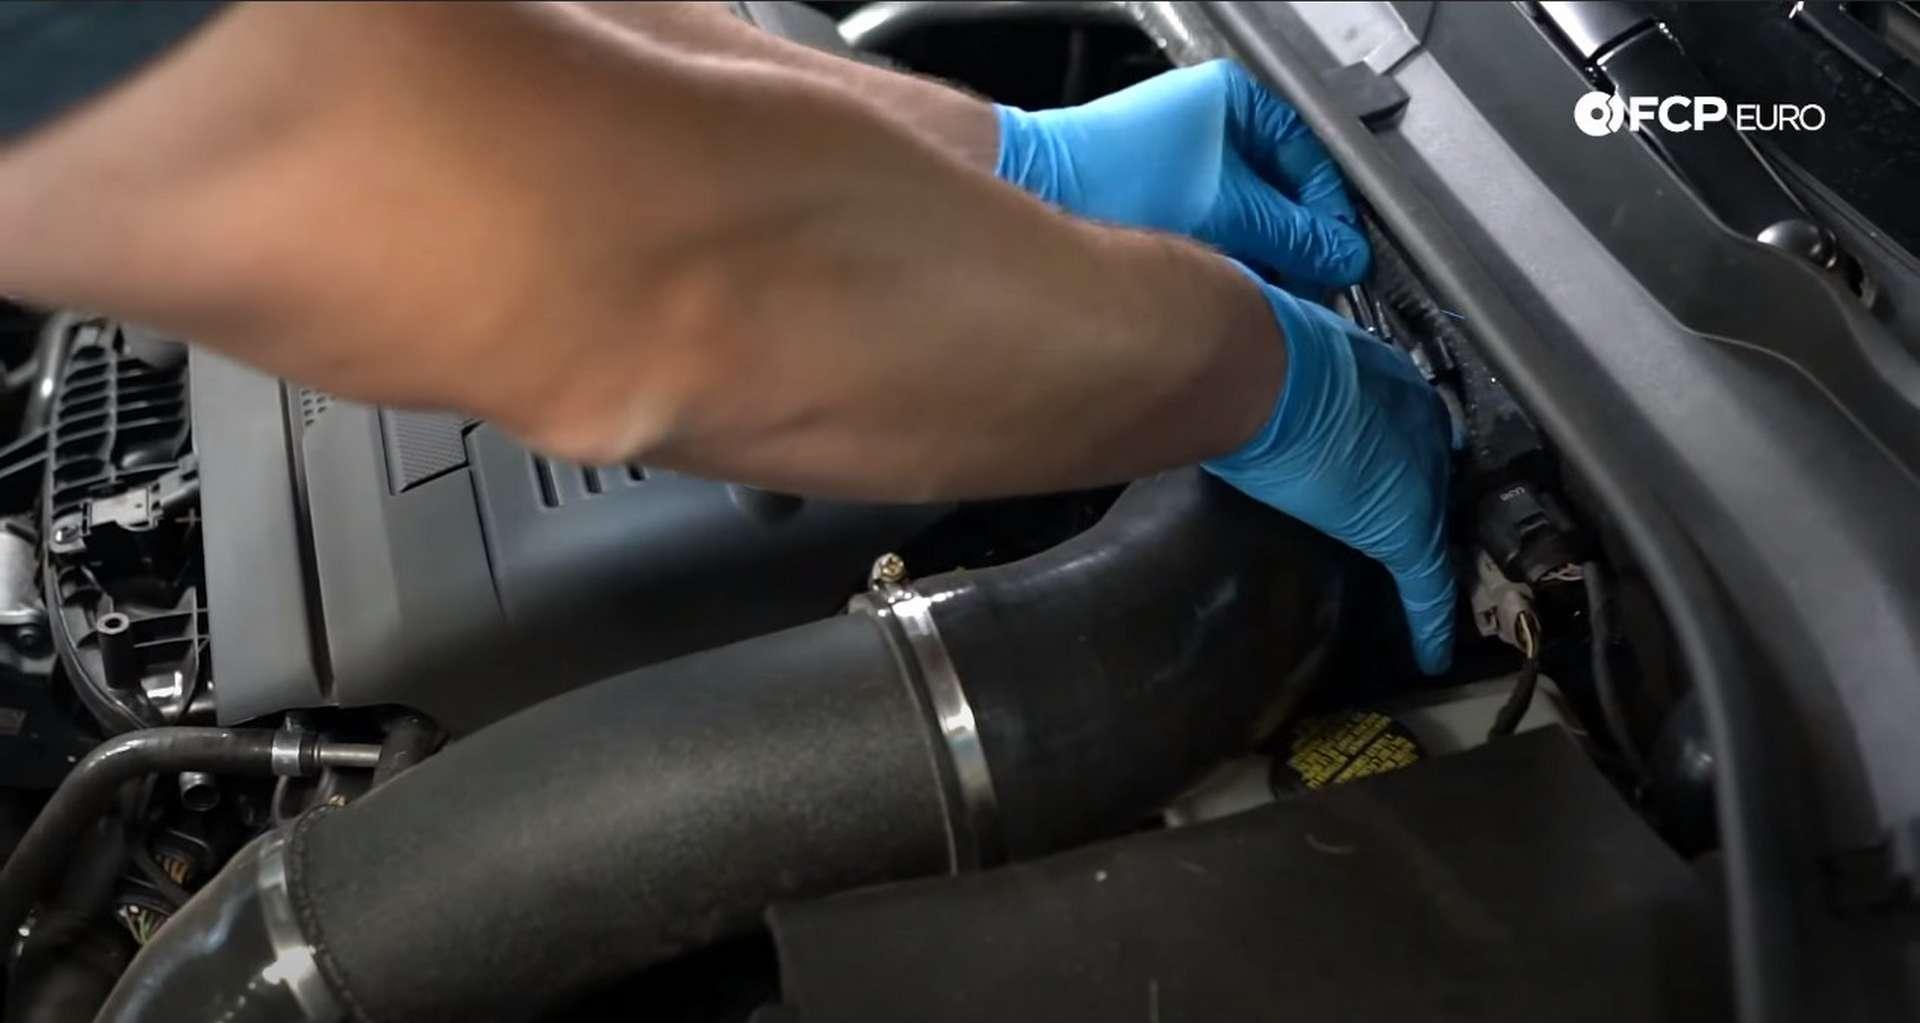 02-DIY_VW_GTI_Clutch-Job-Removing-Intake